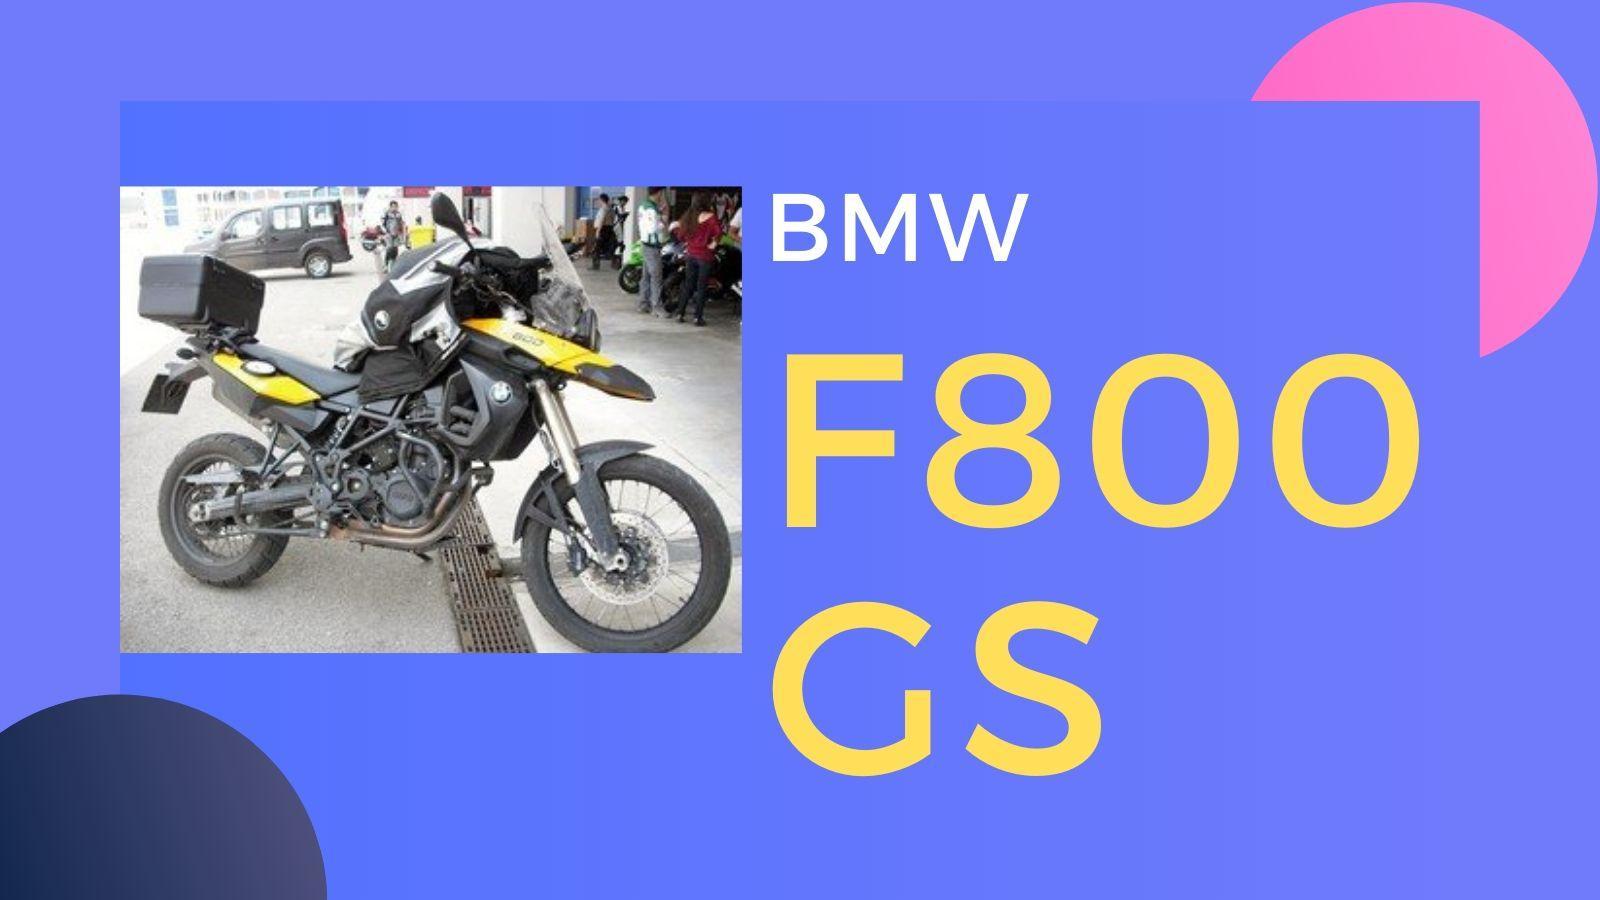 BMW F800 GS tanıtım